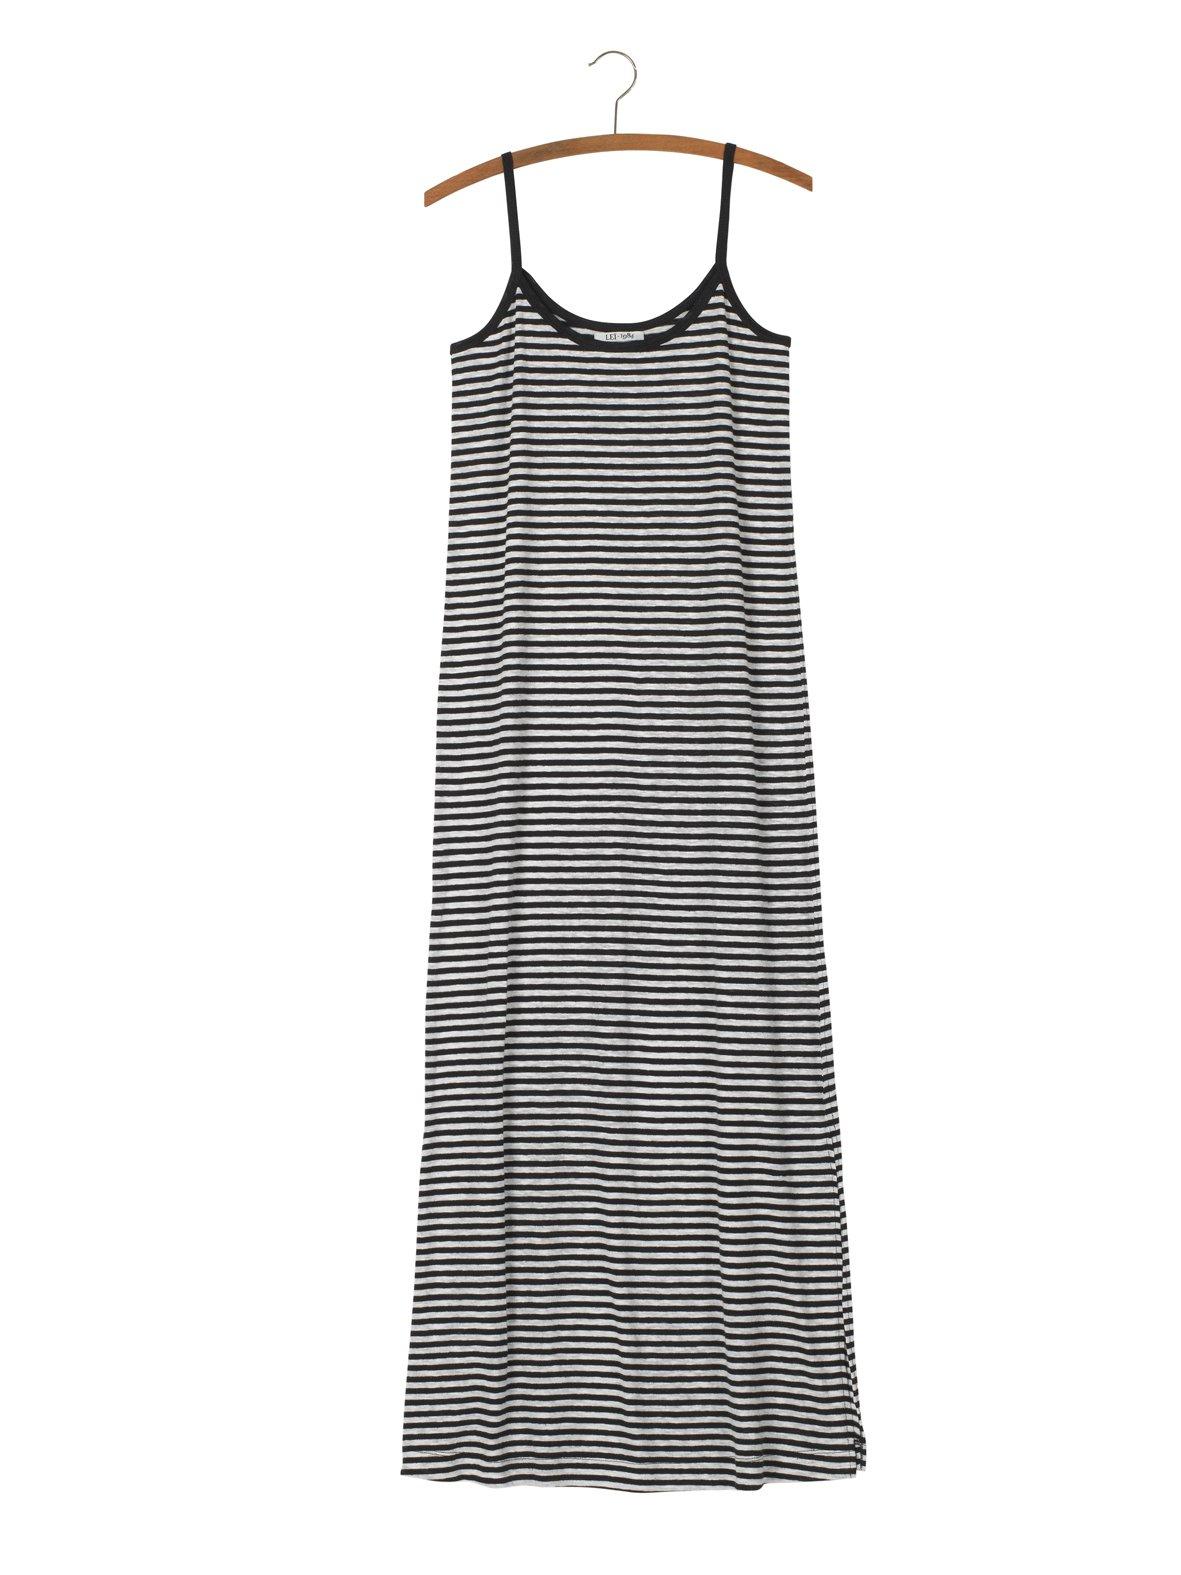 Image of Robe longue rayée coton lin DAPHNEE 89€ -60%